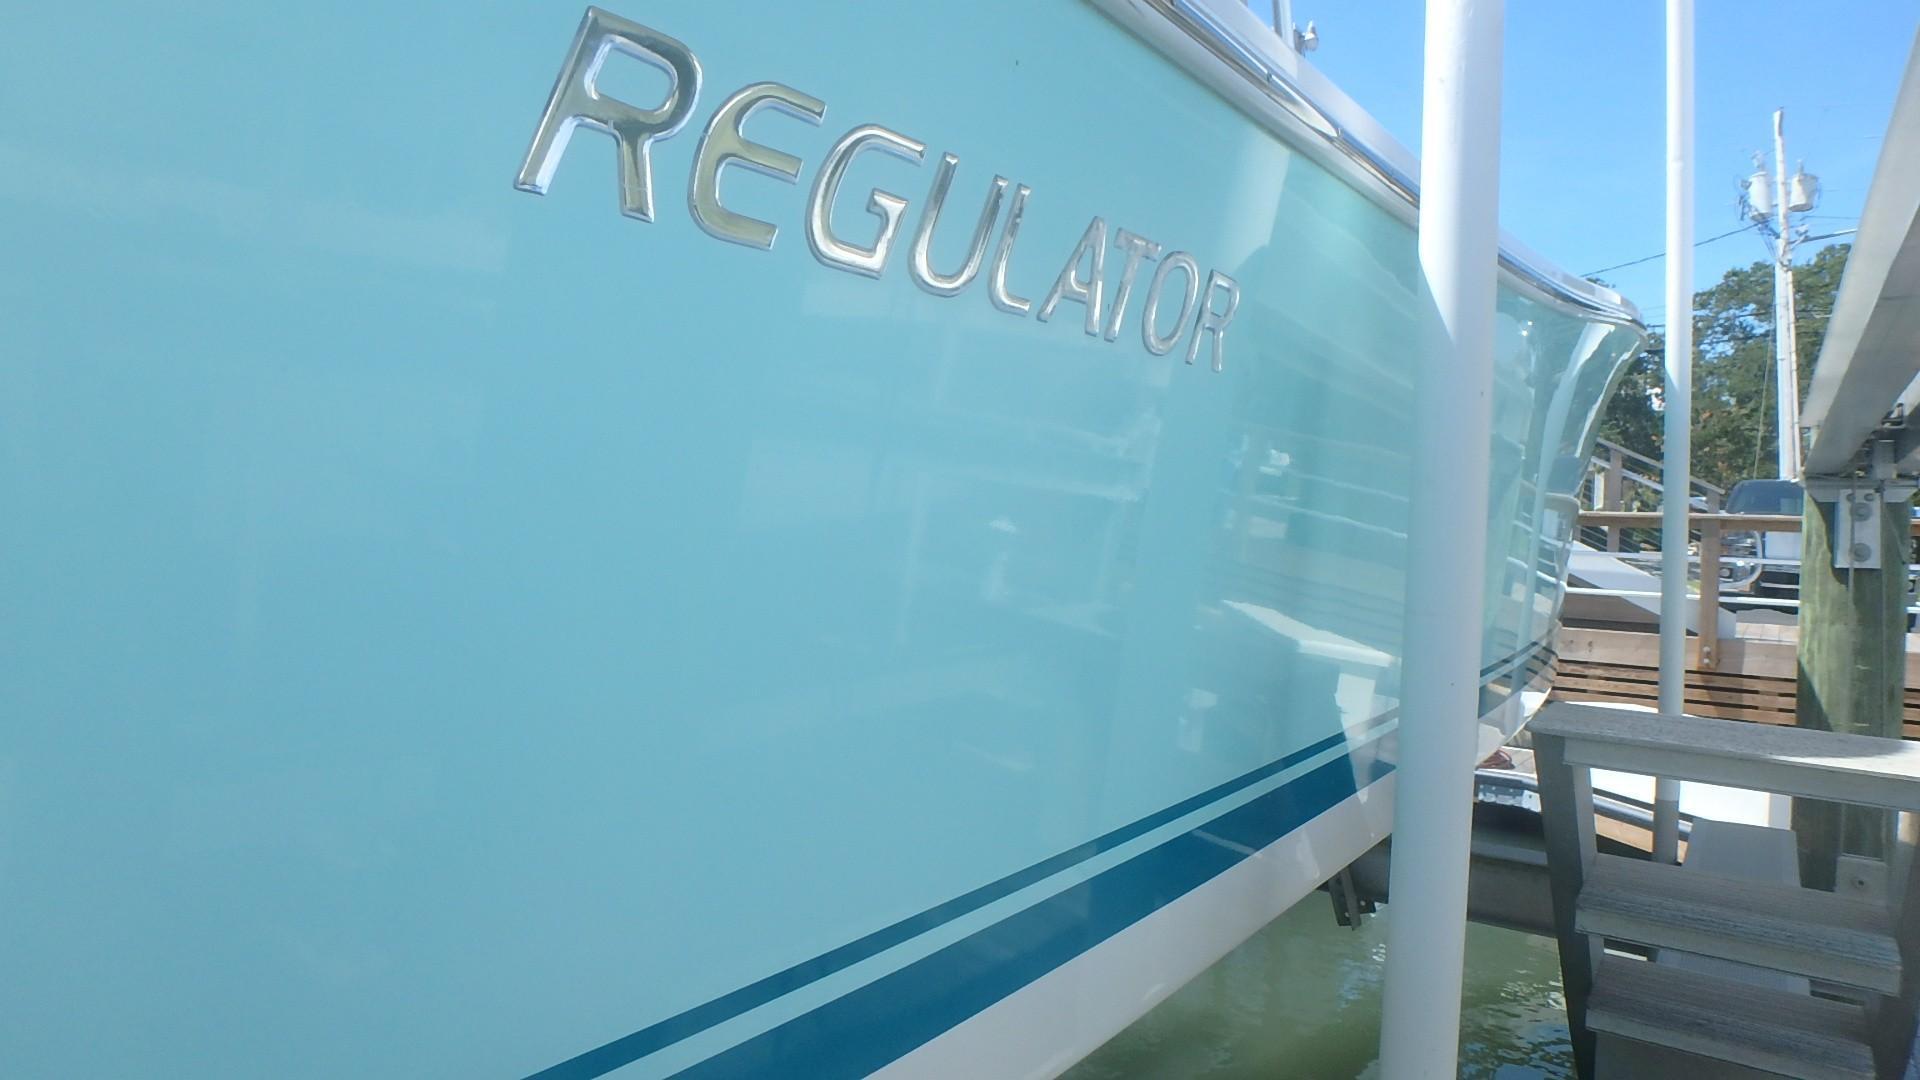 Regulator 23 Forward Seating - Hullside